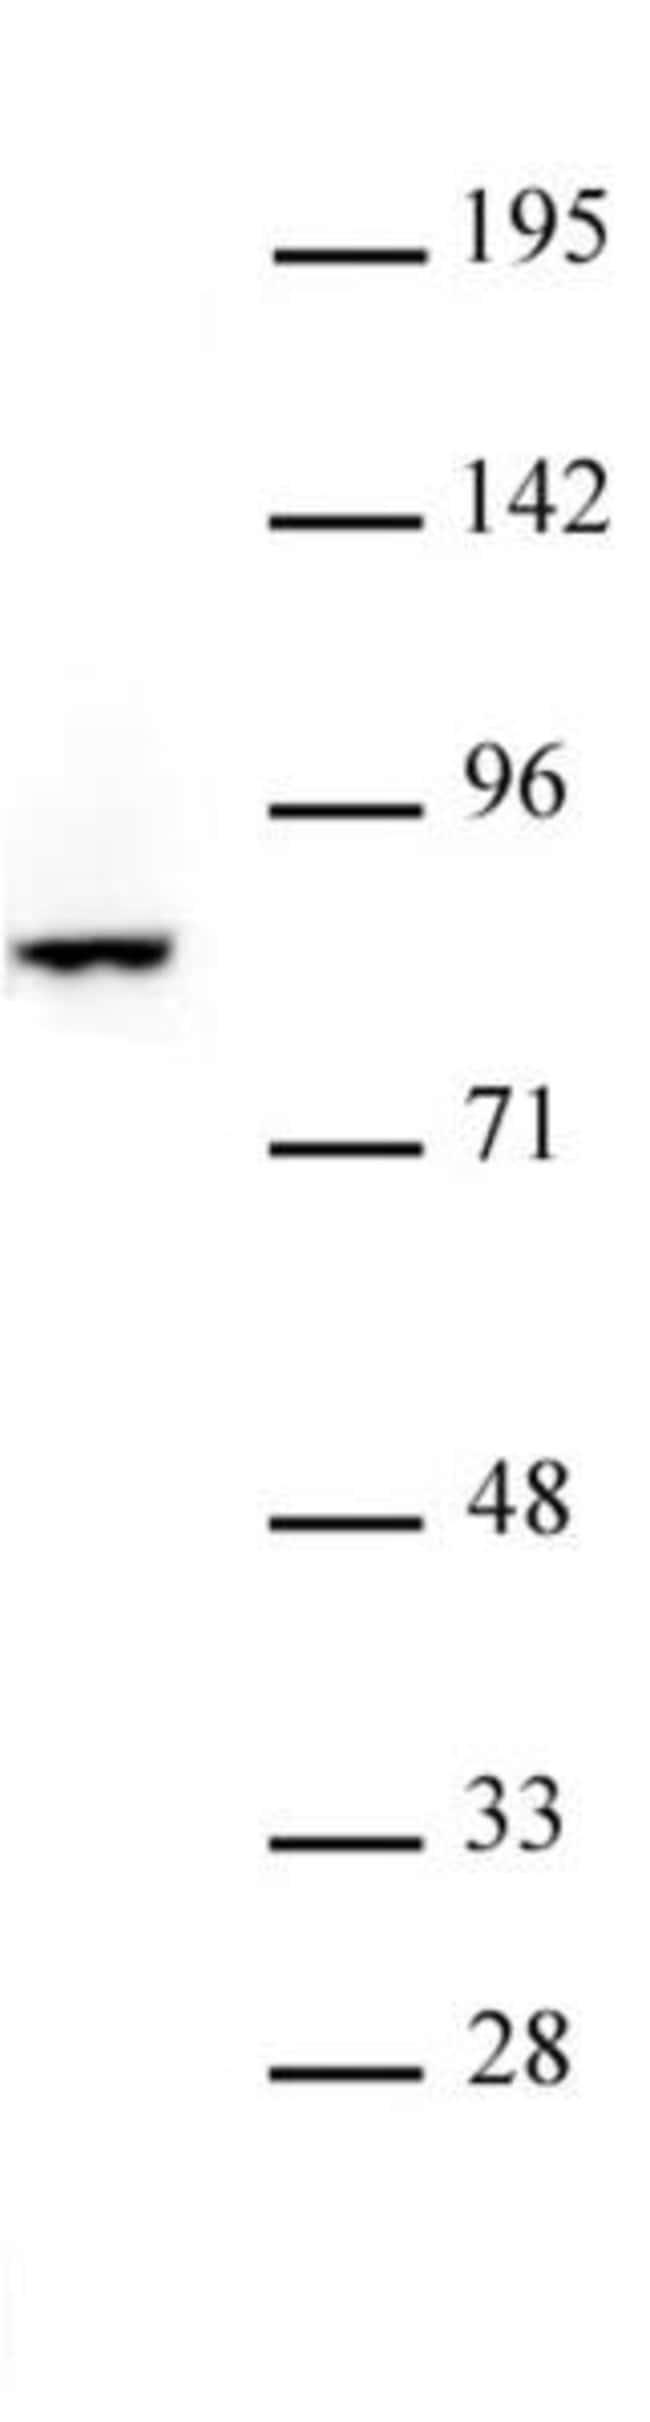 FOXO3 Rabbit anti-Human, Unconjugated, Polyclonal, Active Motif:Antibodies:Primary